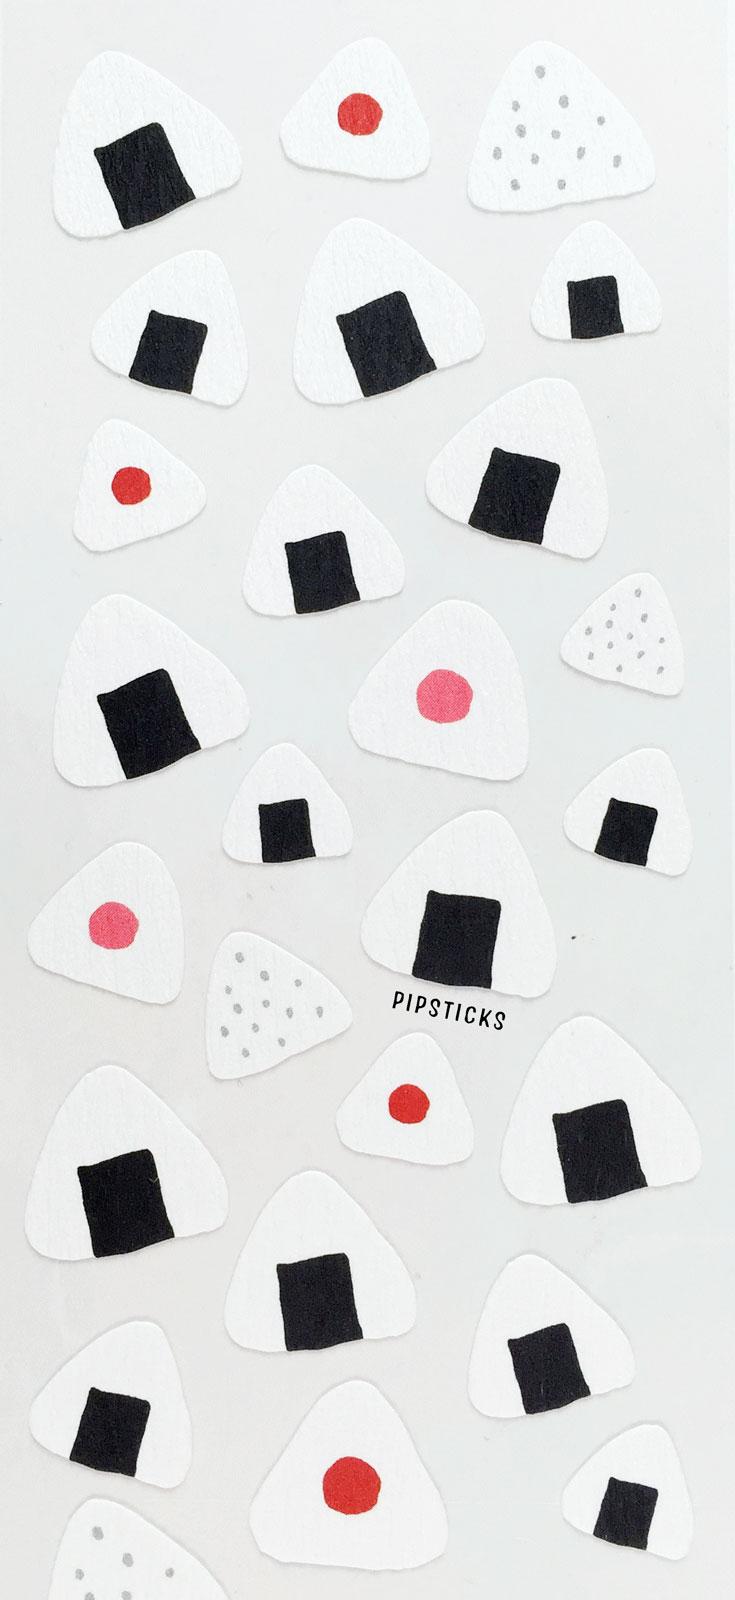 japanese-rice-balls_735